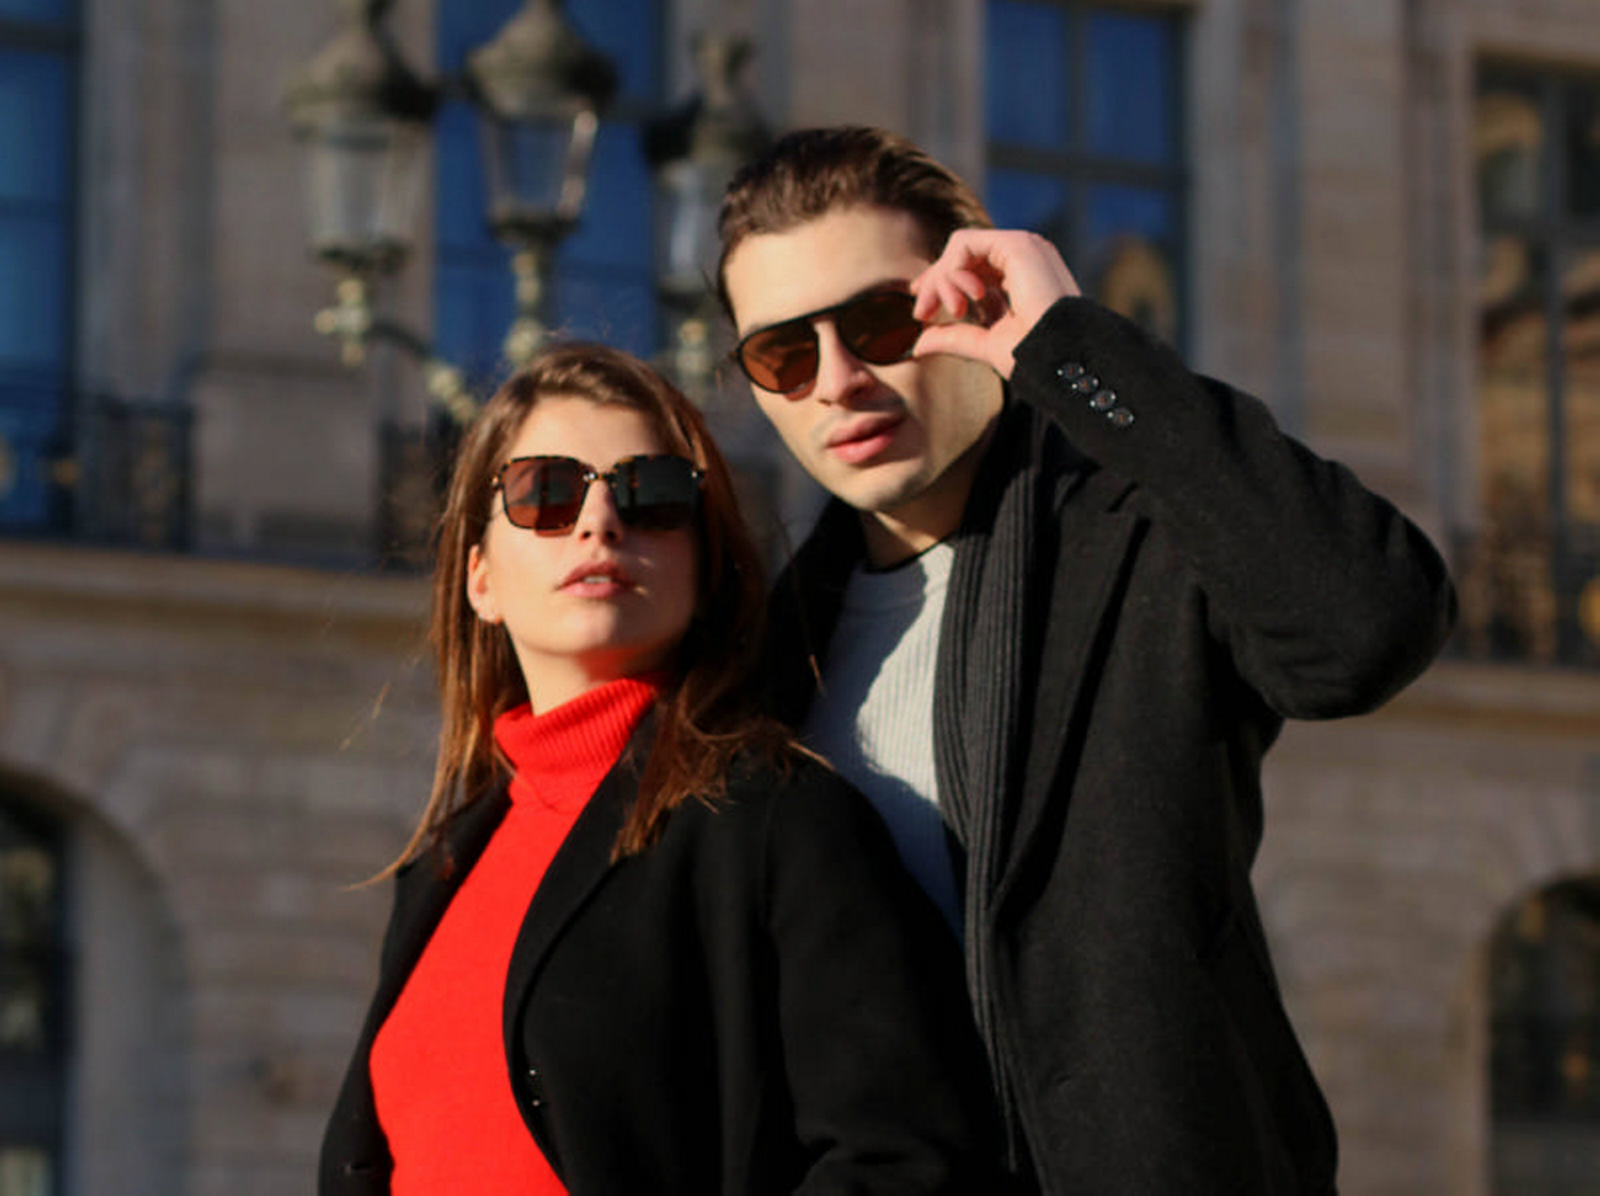 Lunettes MYKITA pour Les Opticiens Eye-Like